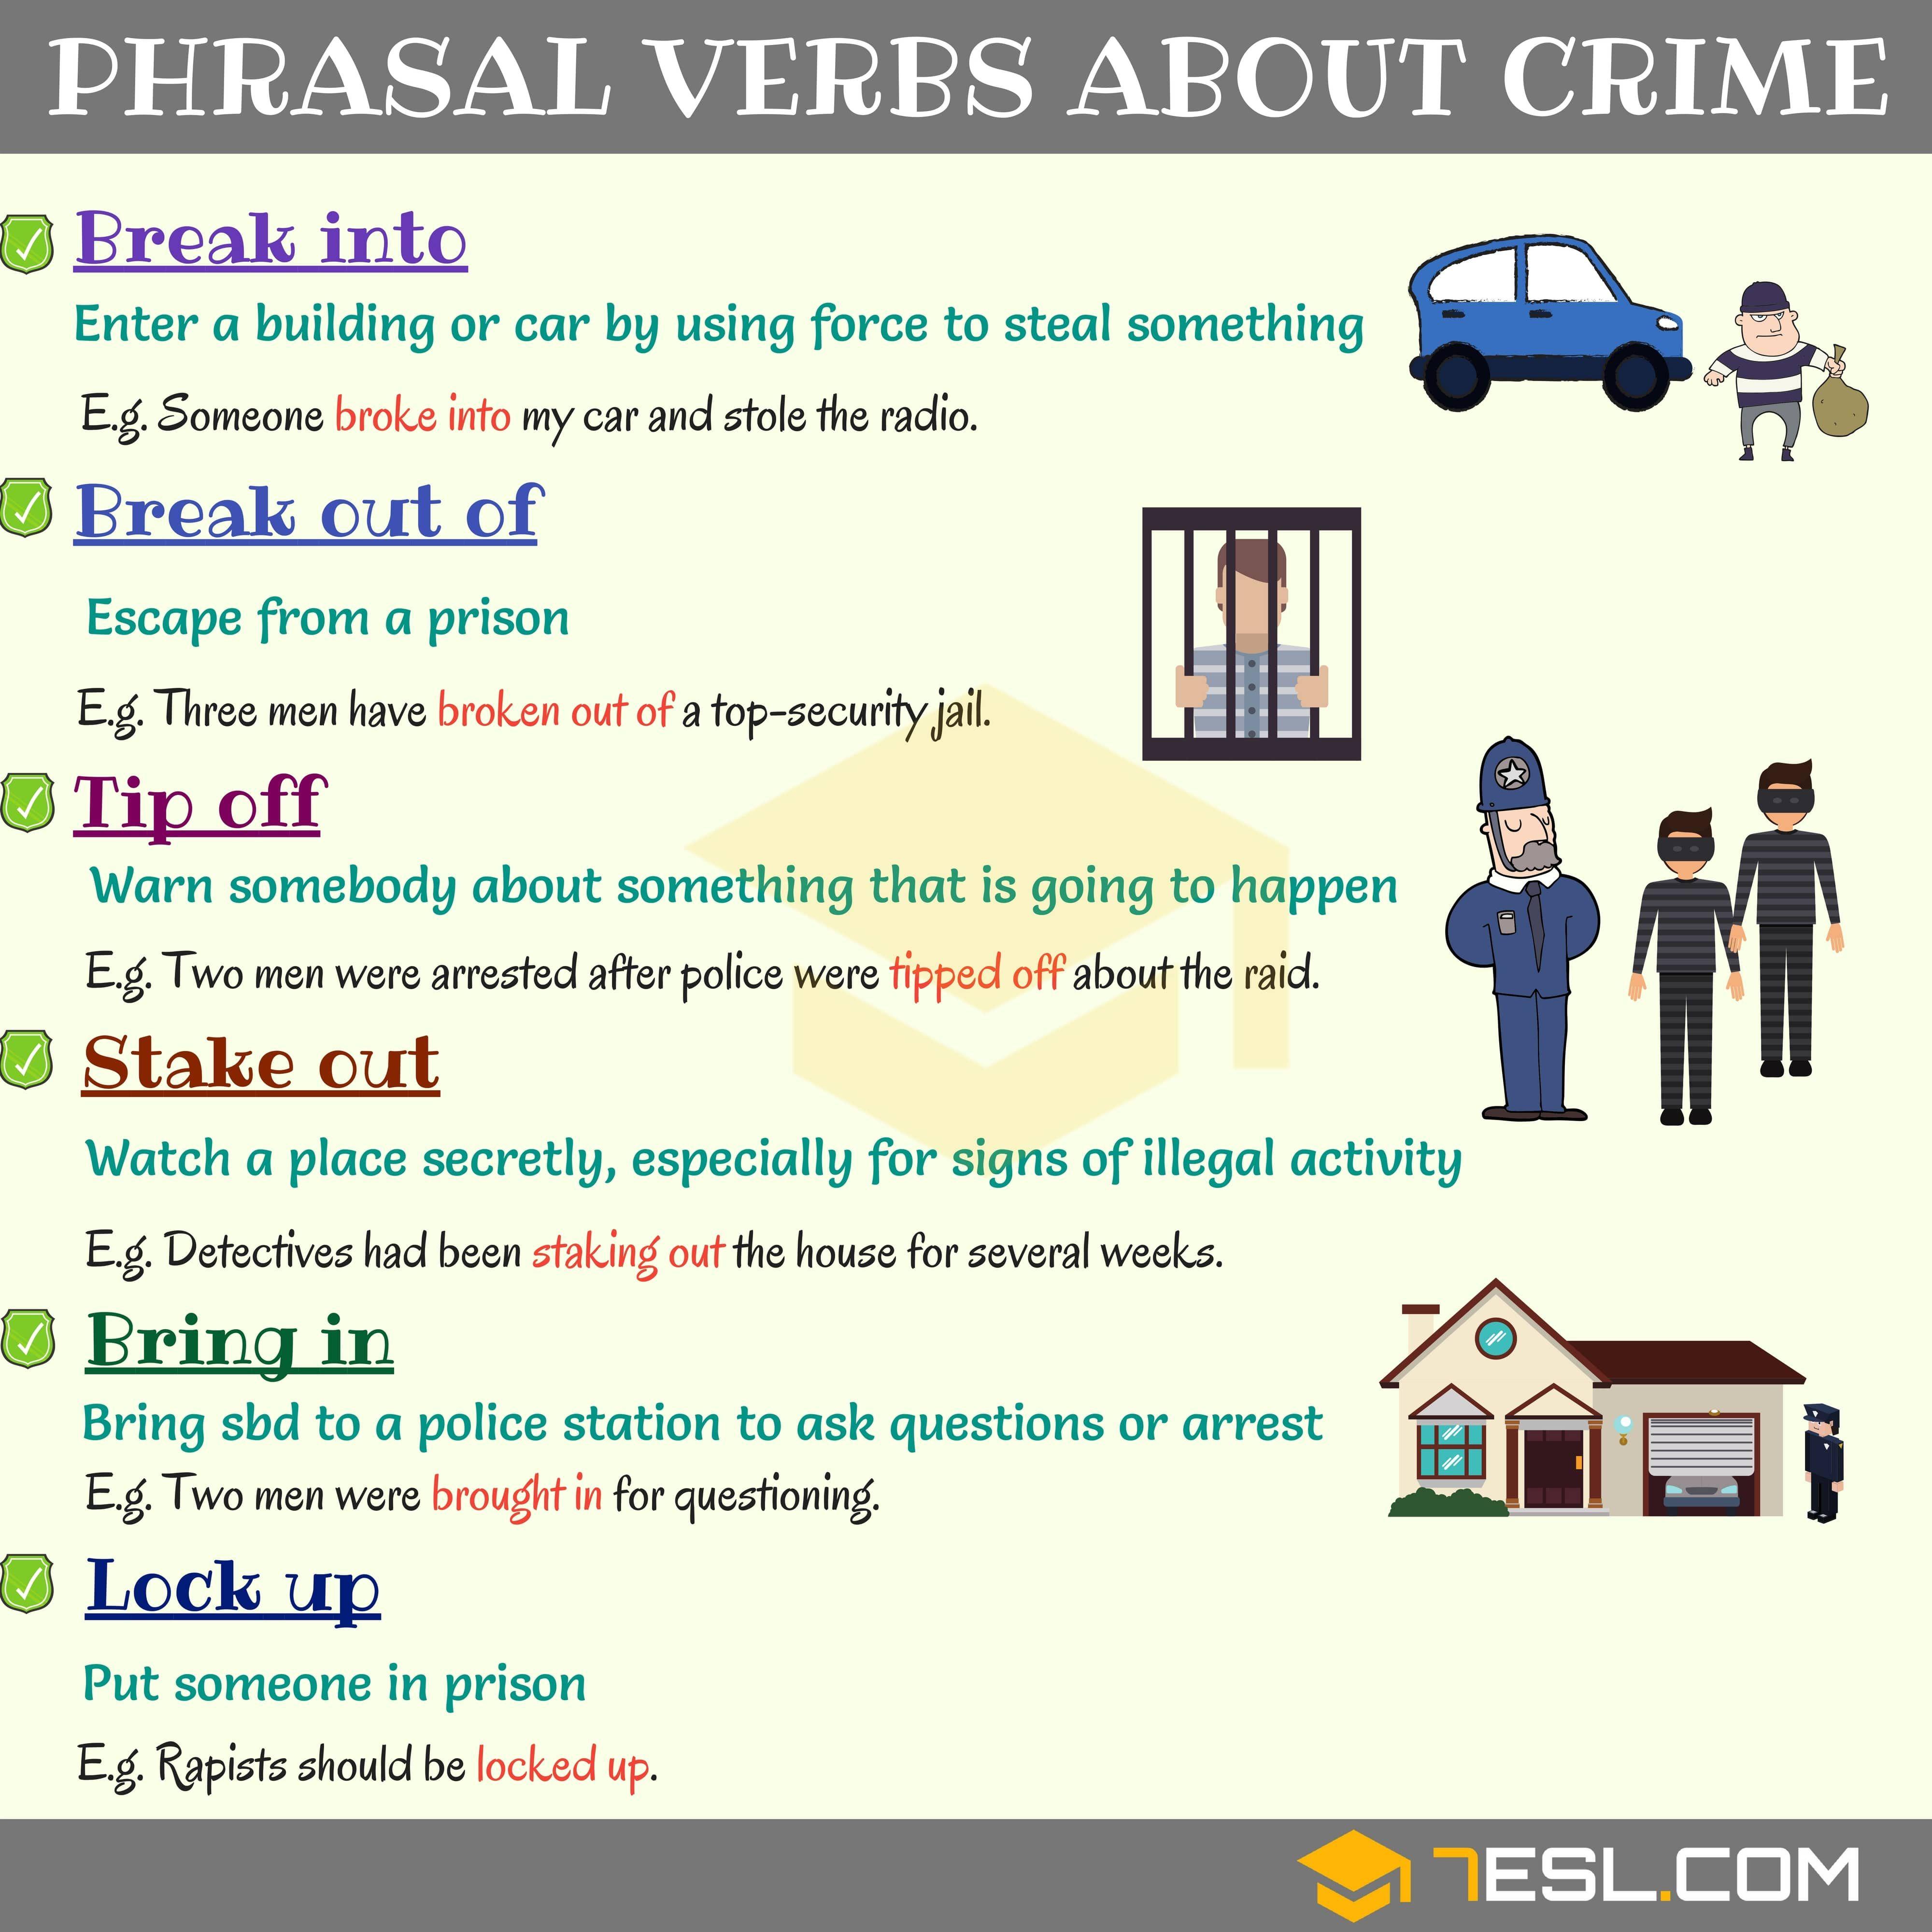 Crime Vocabulary Common Phrasal Verbs About Crime